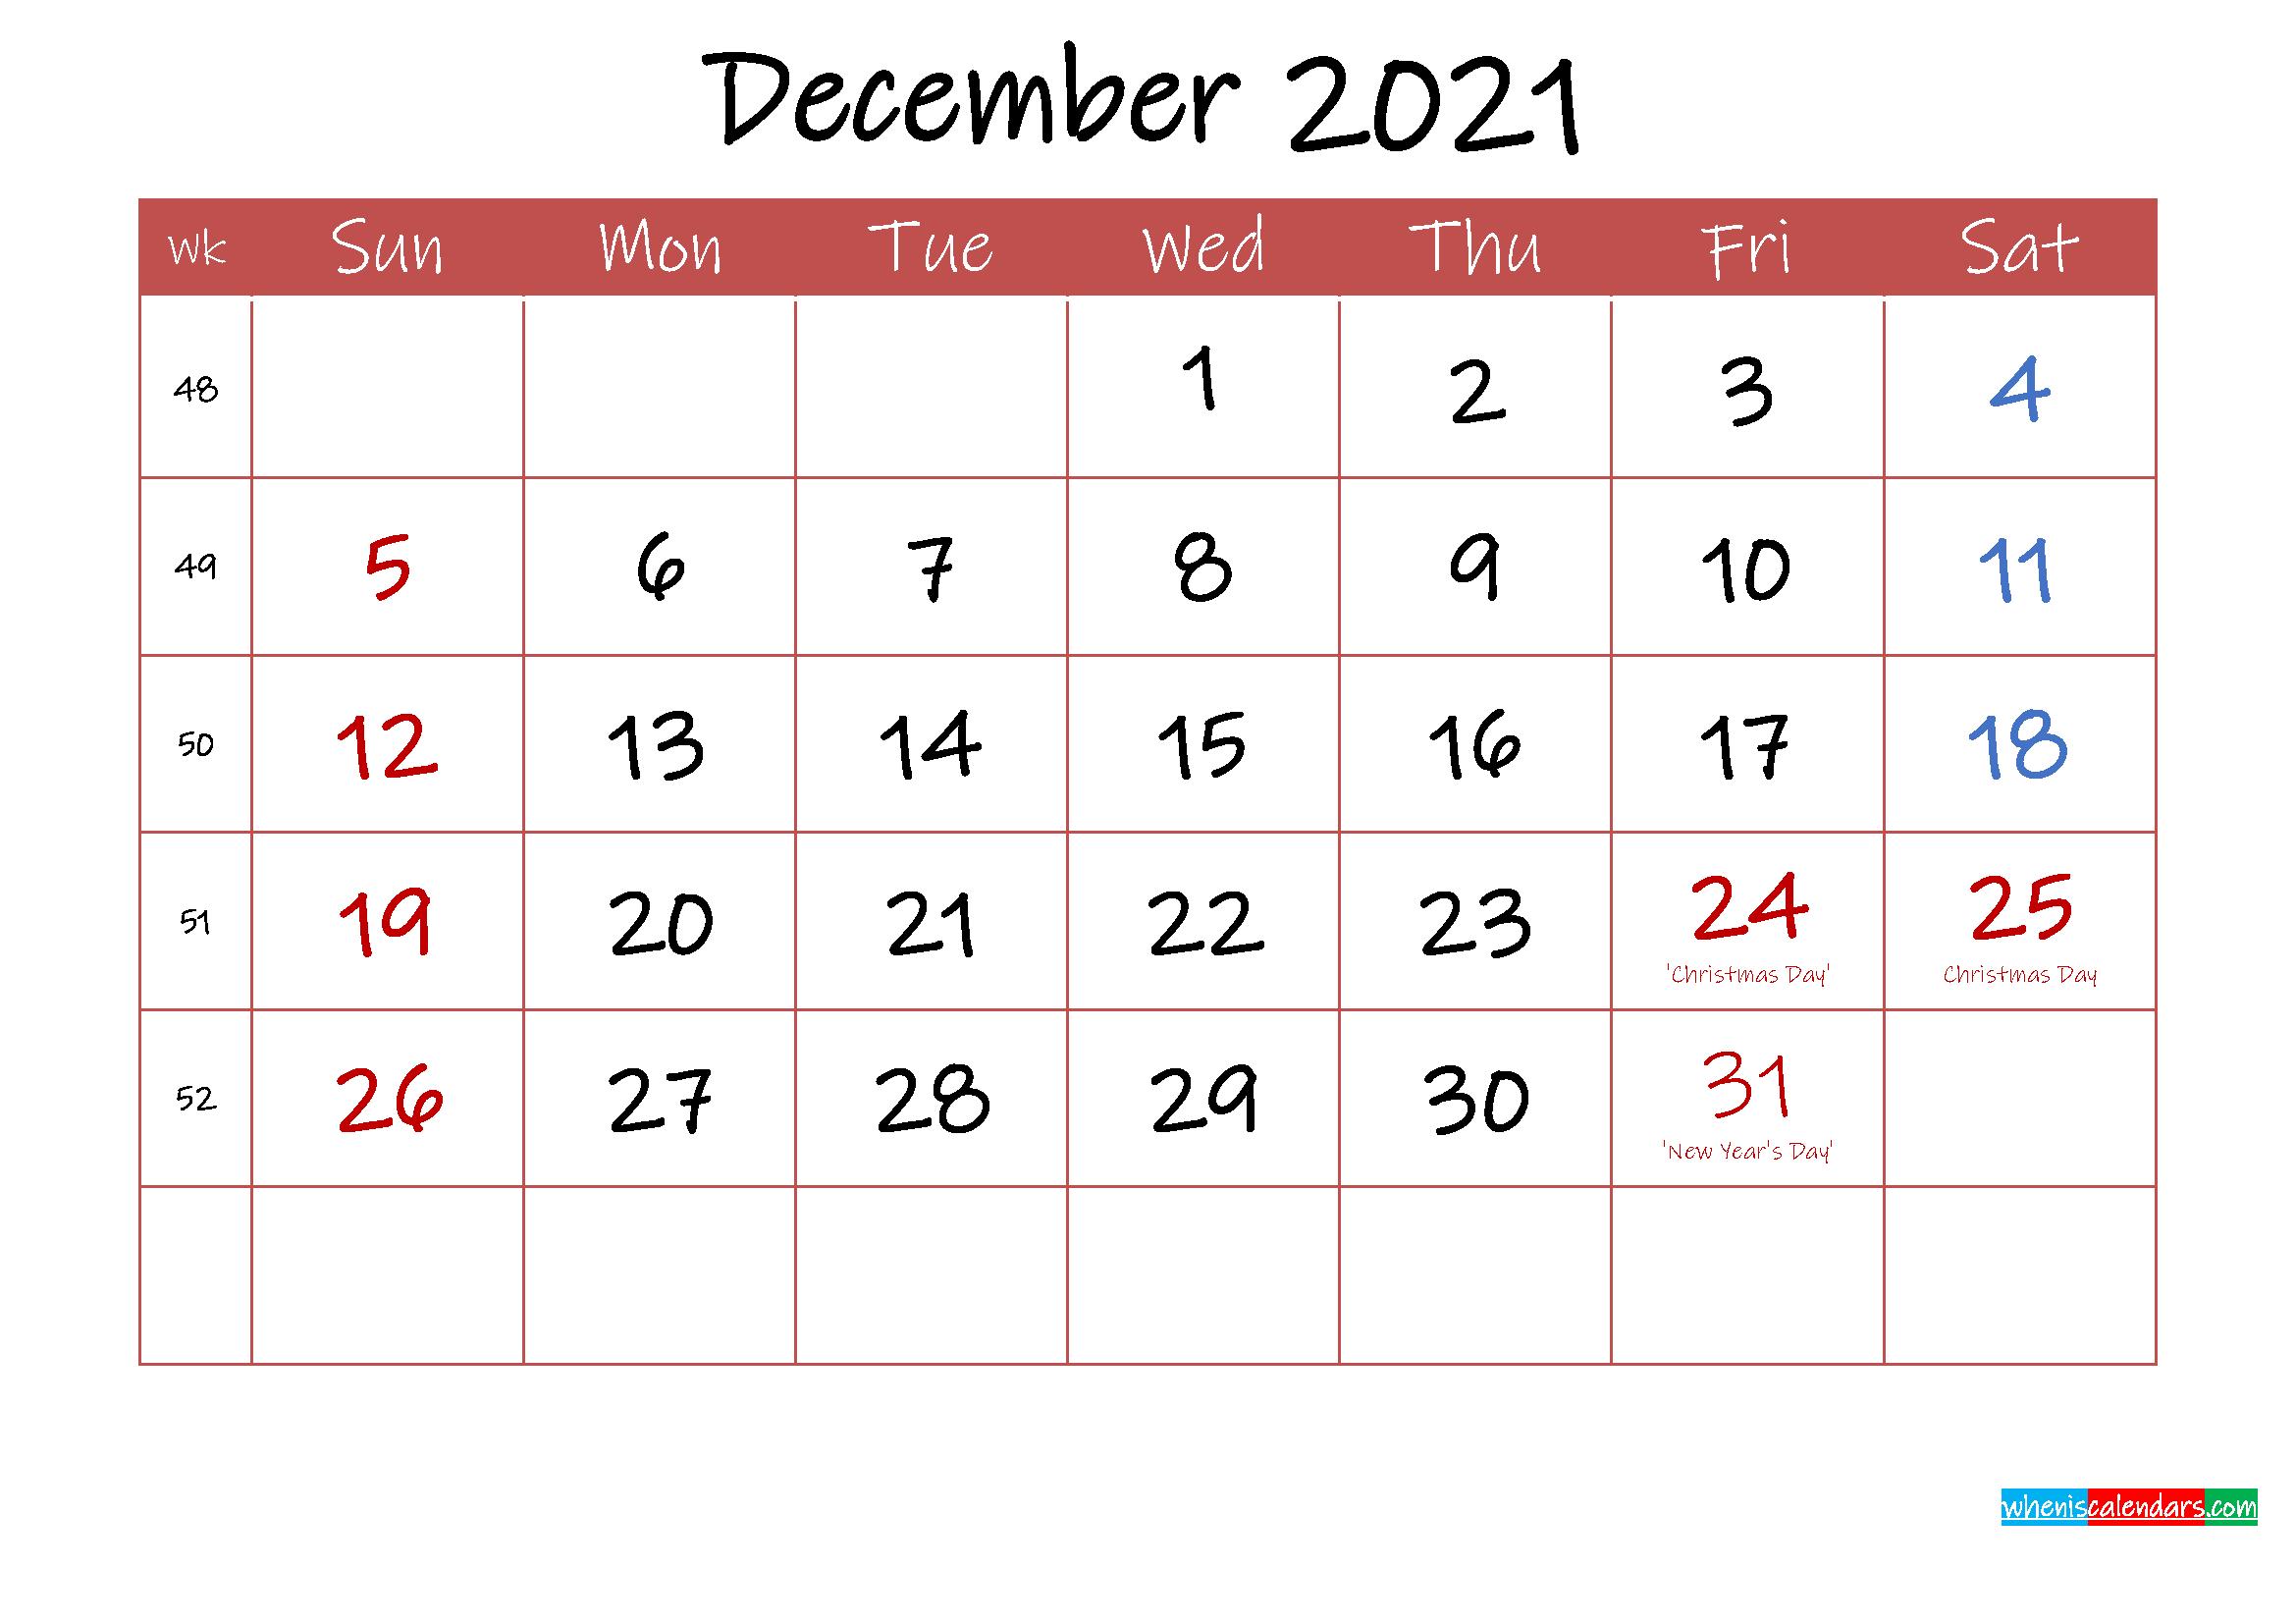 Printable December 2021 Calendar With Holidays - Template